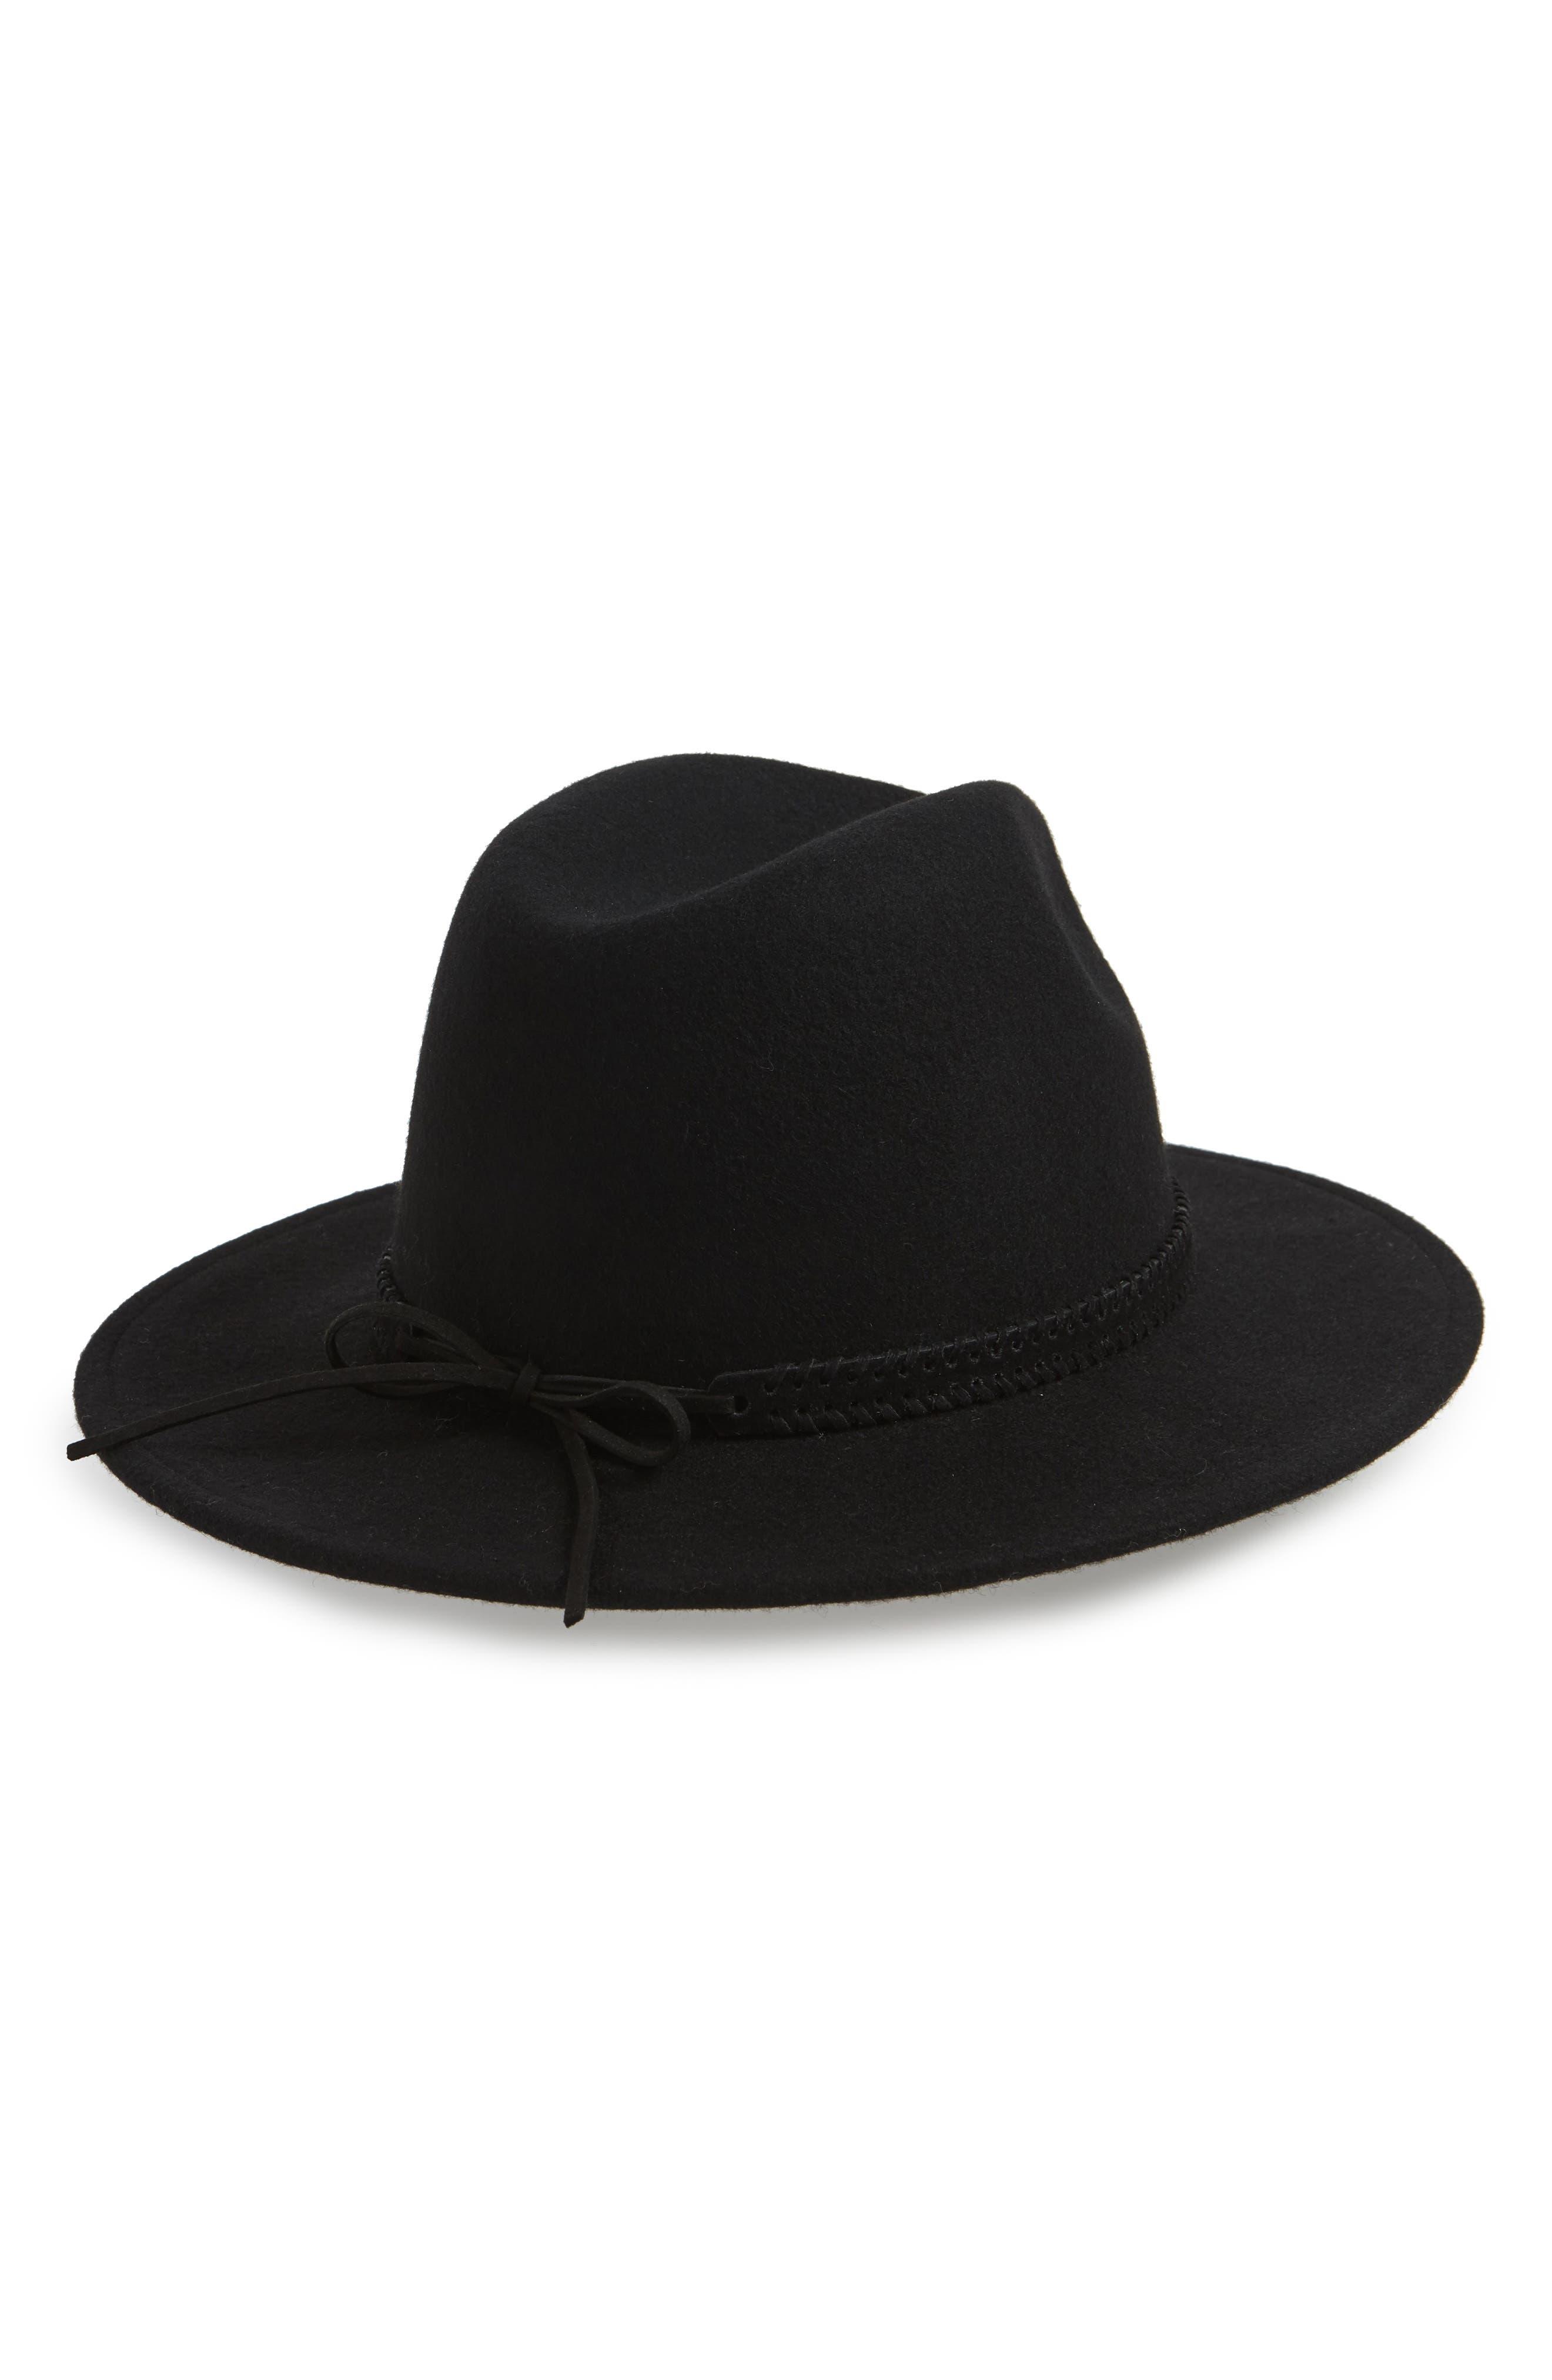 Felt Panama Hat,                             Alternate thumbnail 2, color,                             BLACK